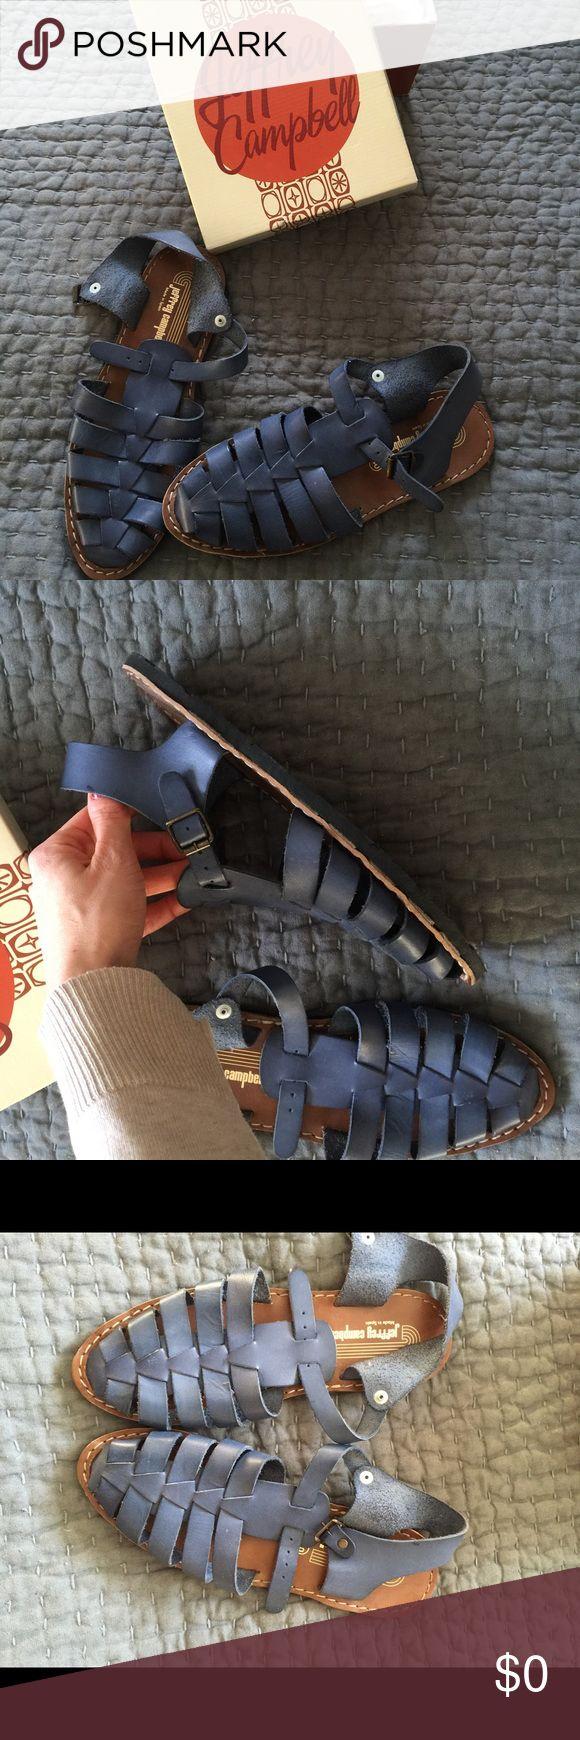 Jeffrey Campbell sandals Blue Jeffery Campbell blue sandals. Worn once. Size 40 Jeffrey Campbell Shoes